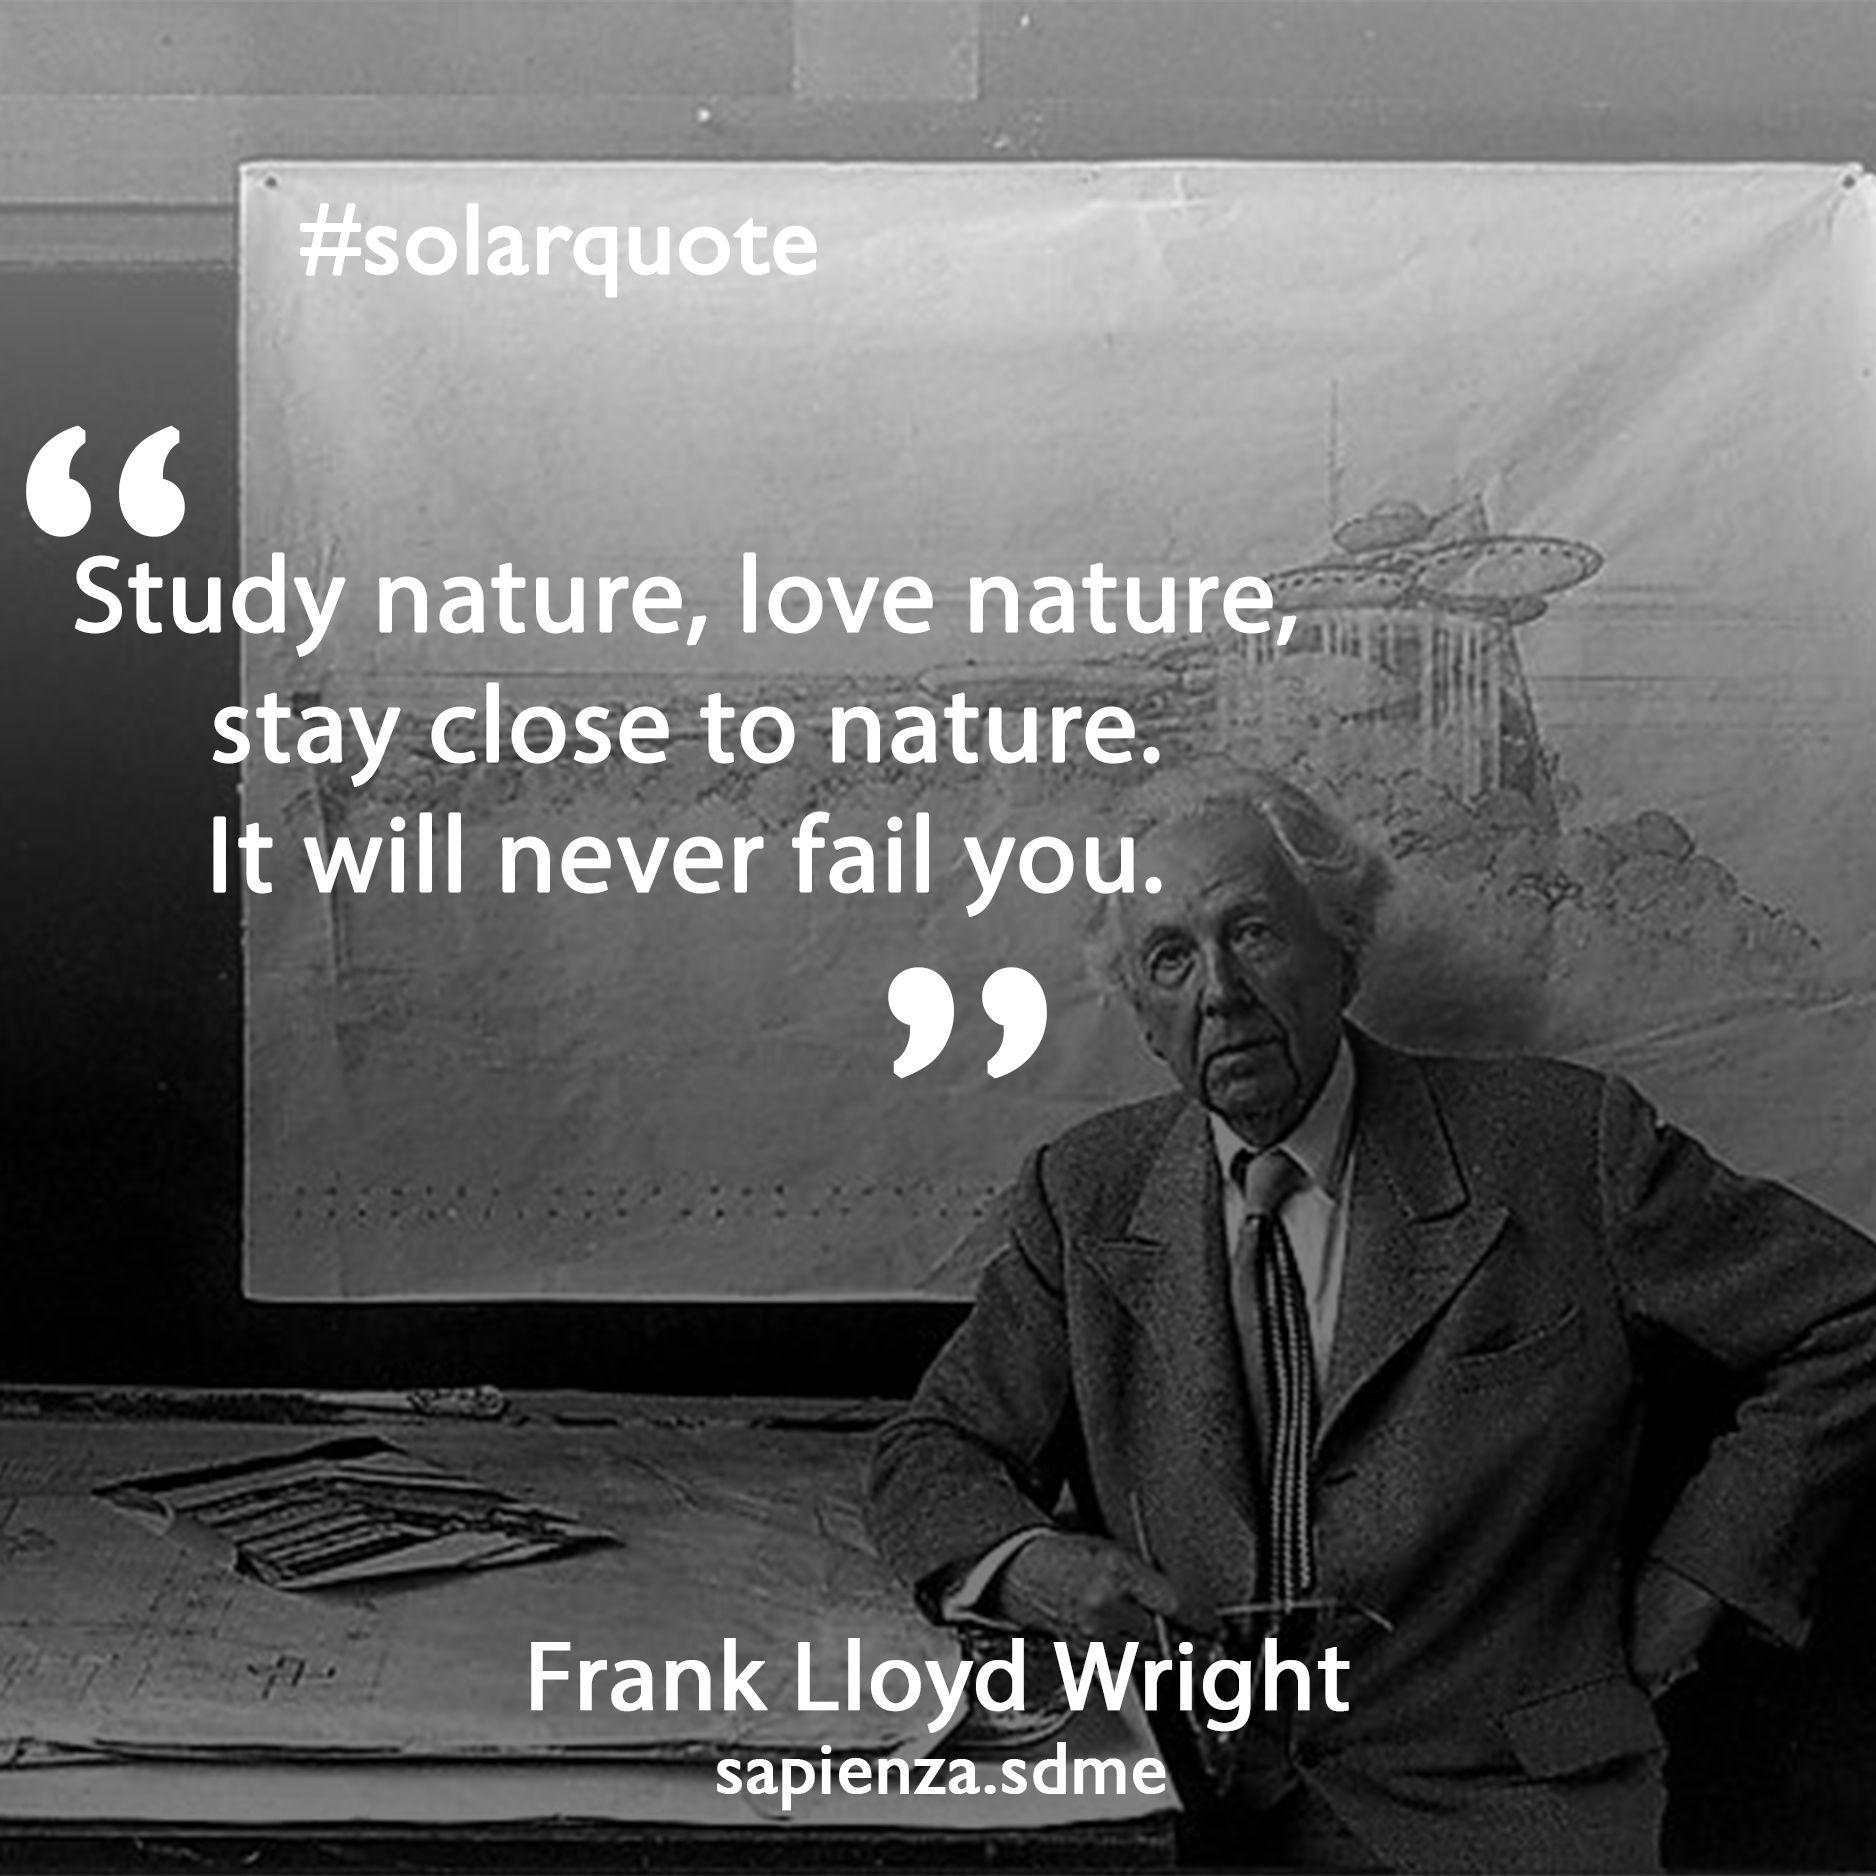 Frank Lloyd Wright Born Lincoln June 8 1867 April 9